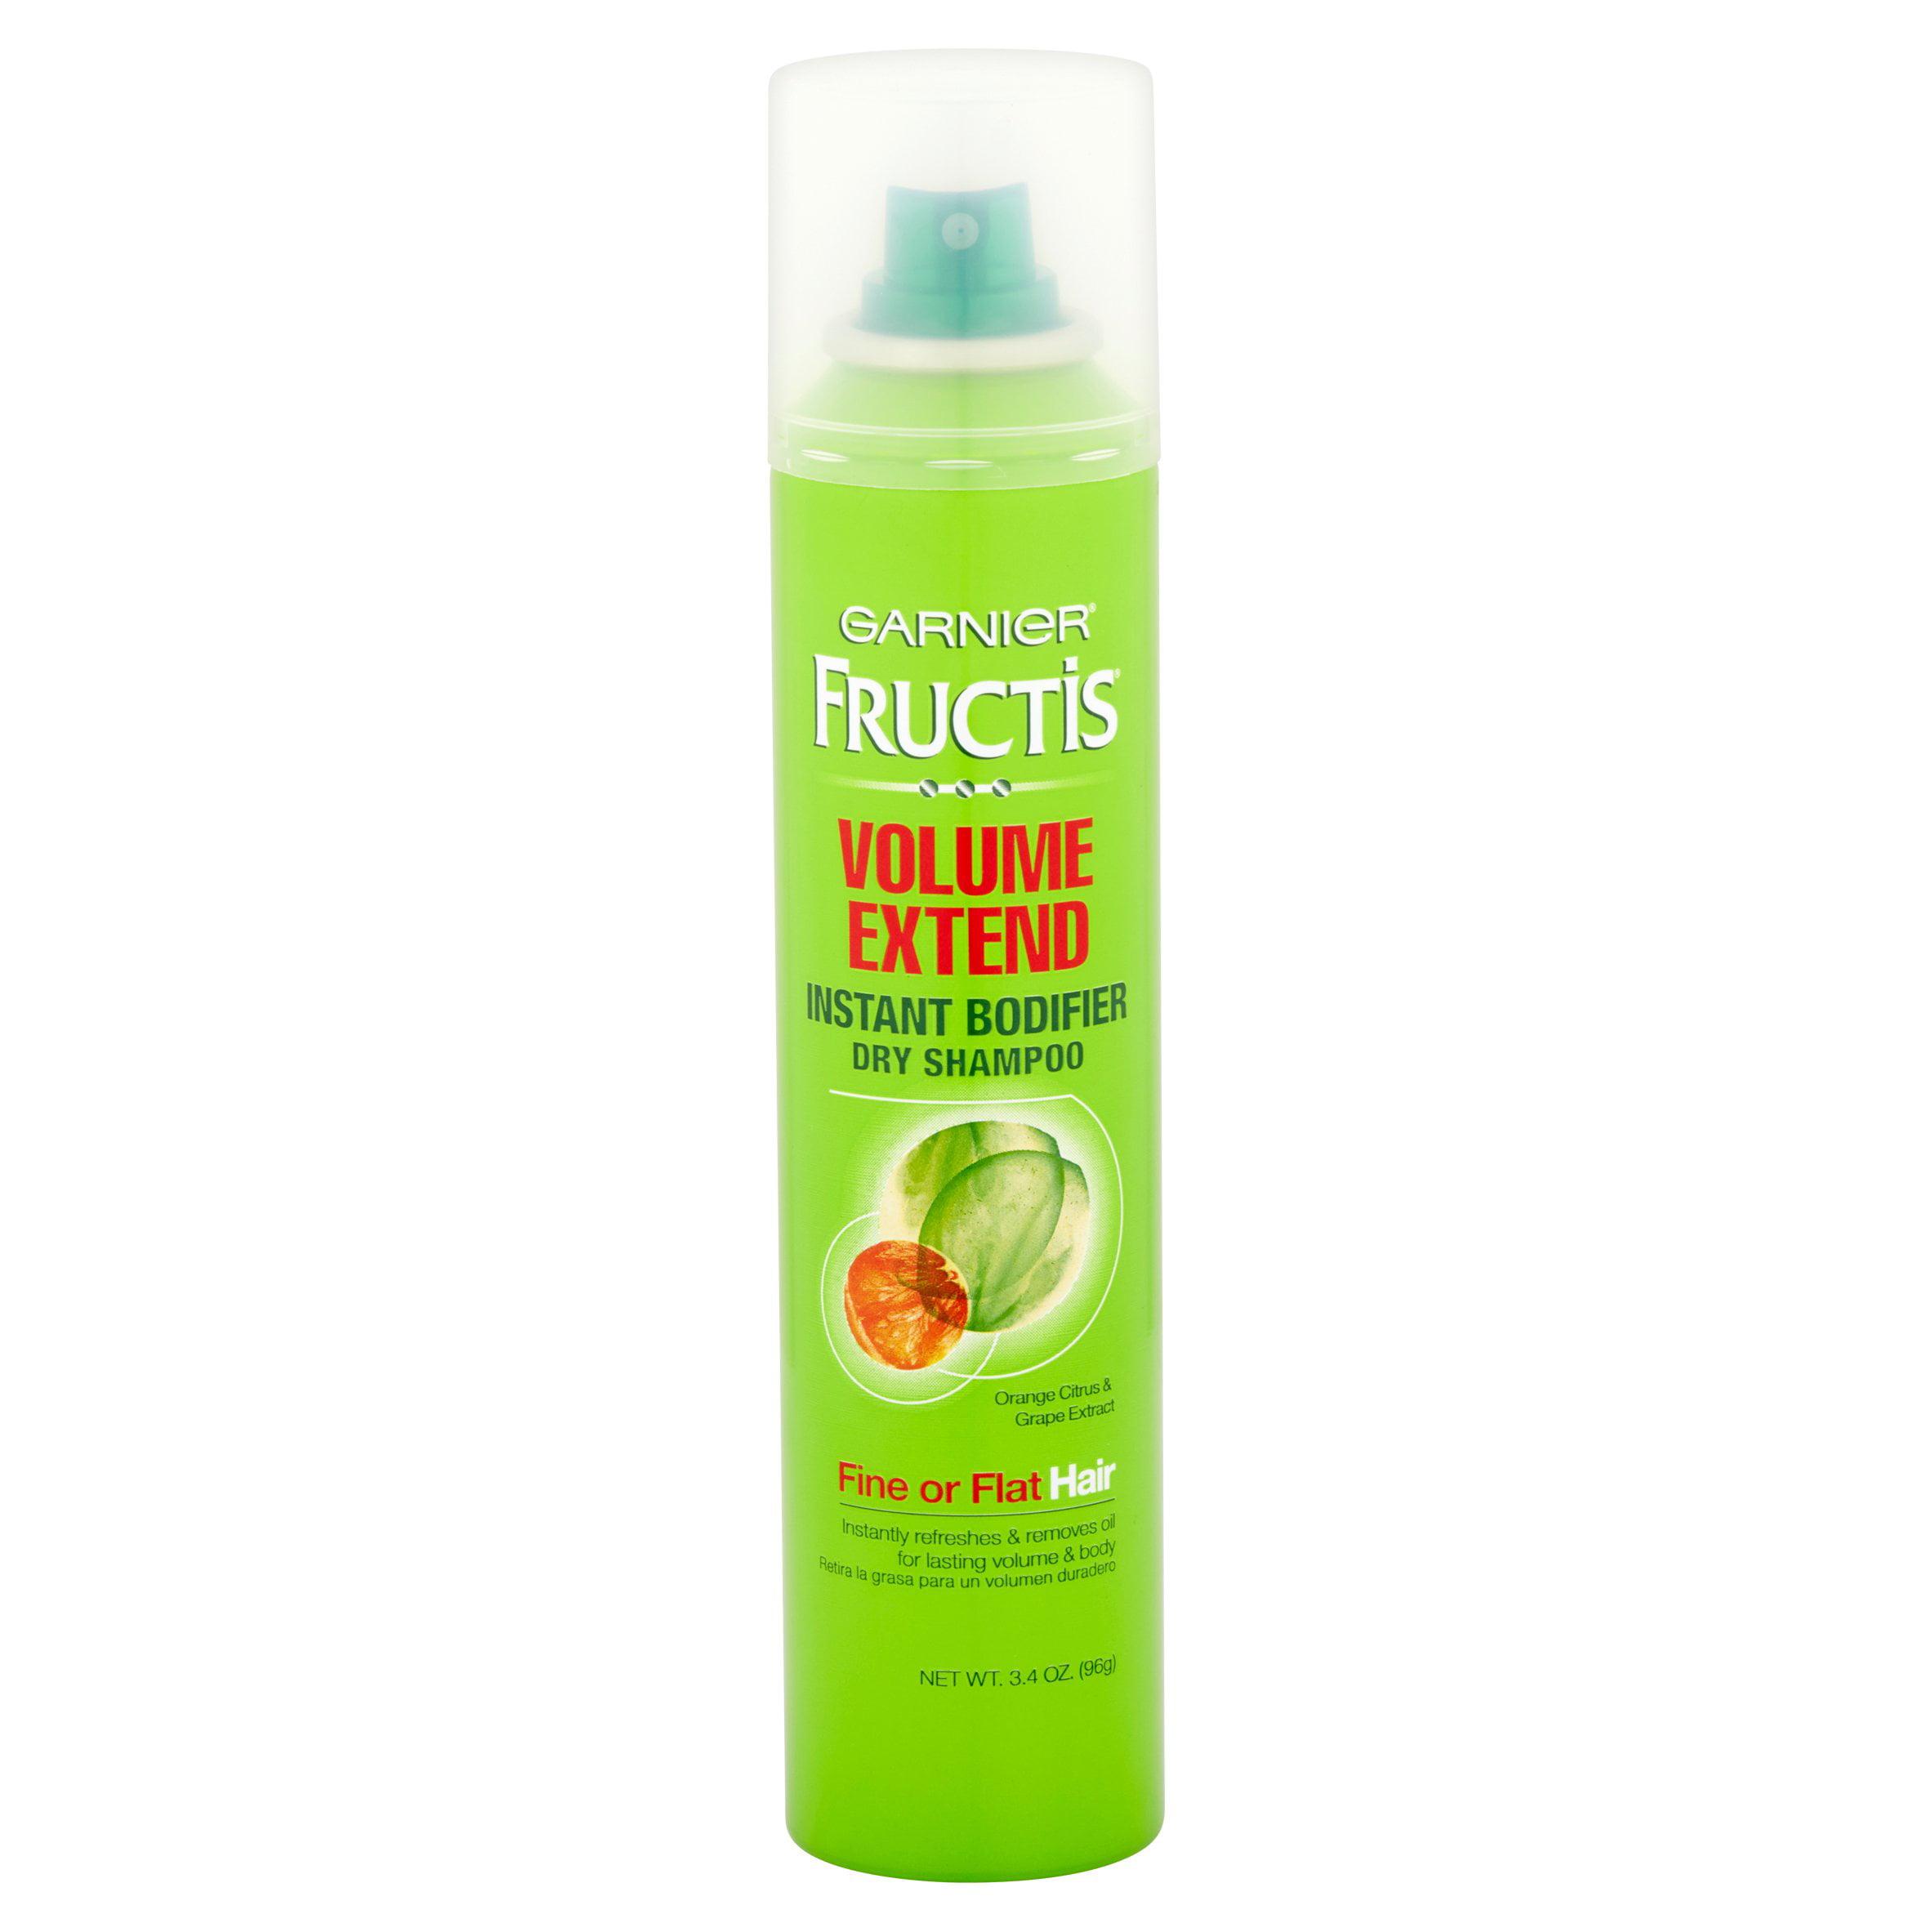 Garnier Fructis Volume Extend Instant Bodifier Dry Shampoo Orange ...